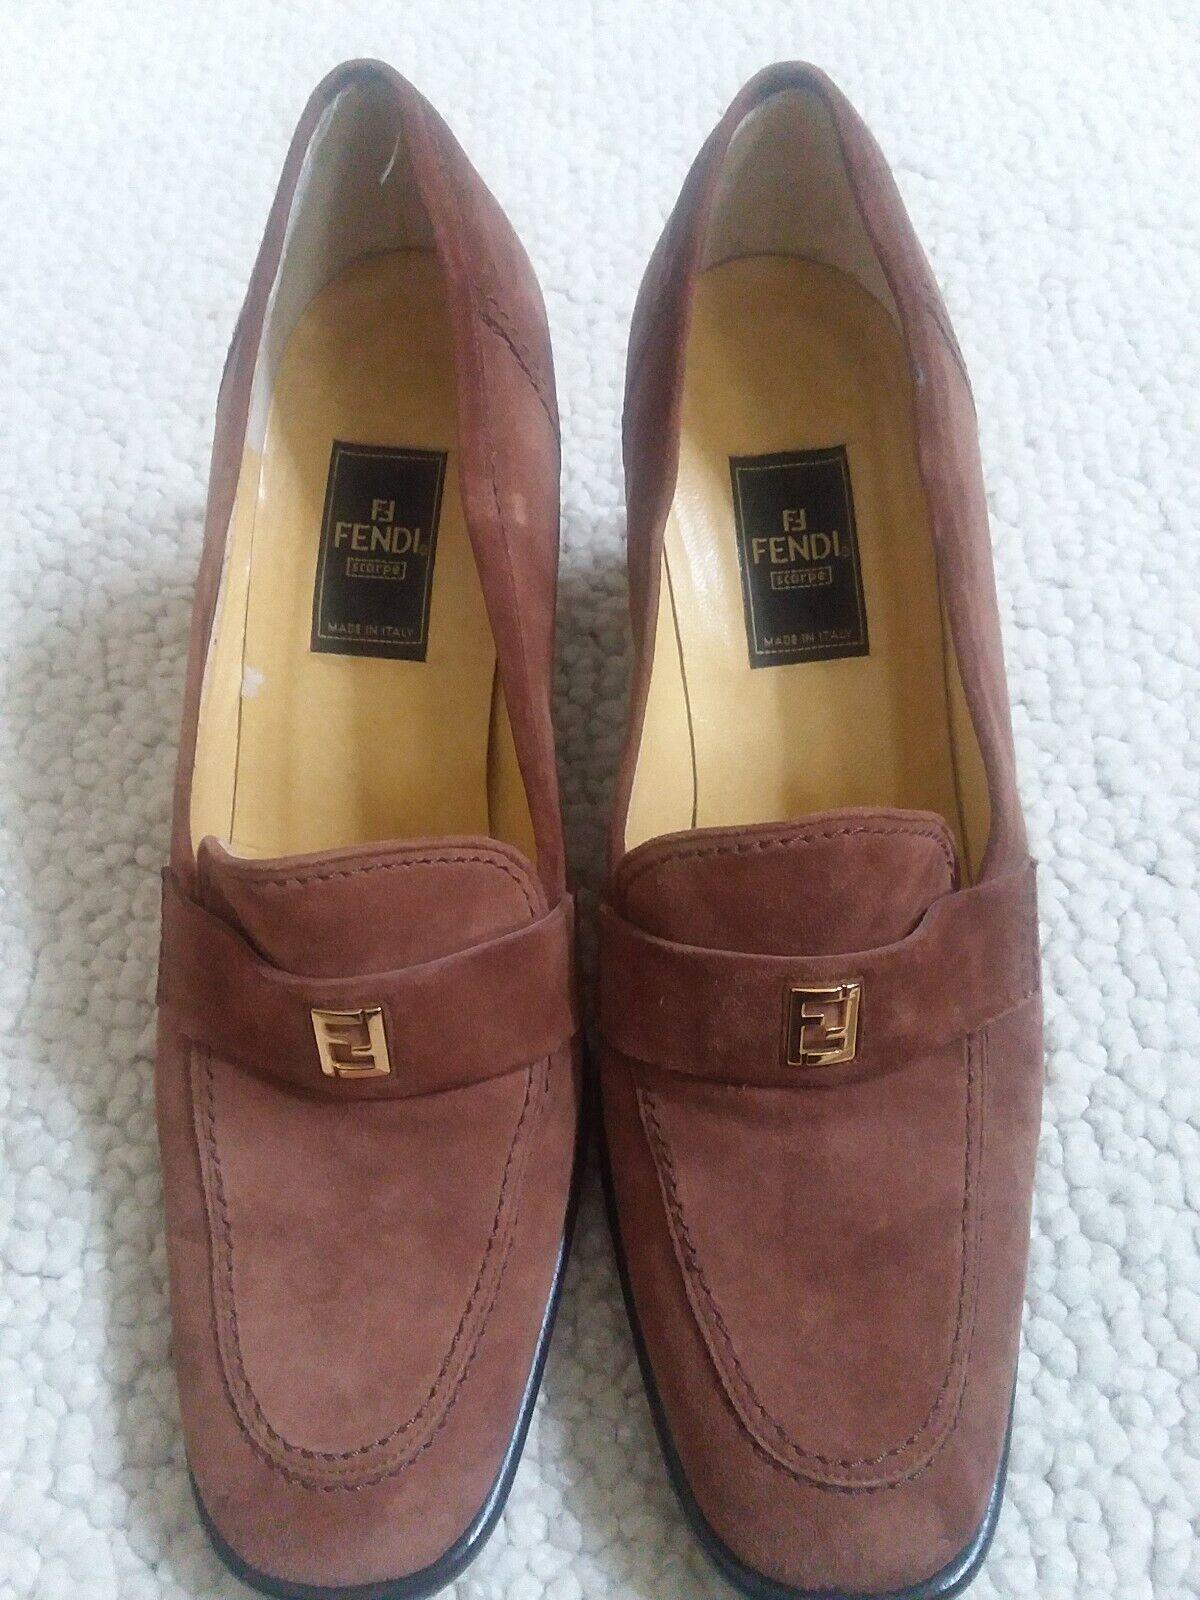 37477d73dd9 FENDI SUEDE LOAFER heels heels heels 9 MED WOMEN 9989d5 - mimhv ...